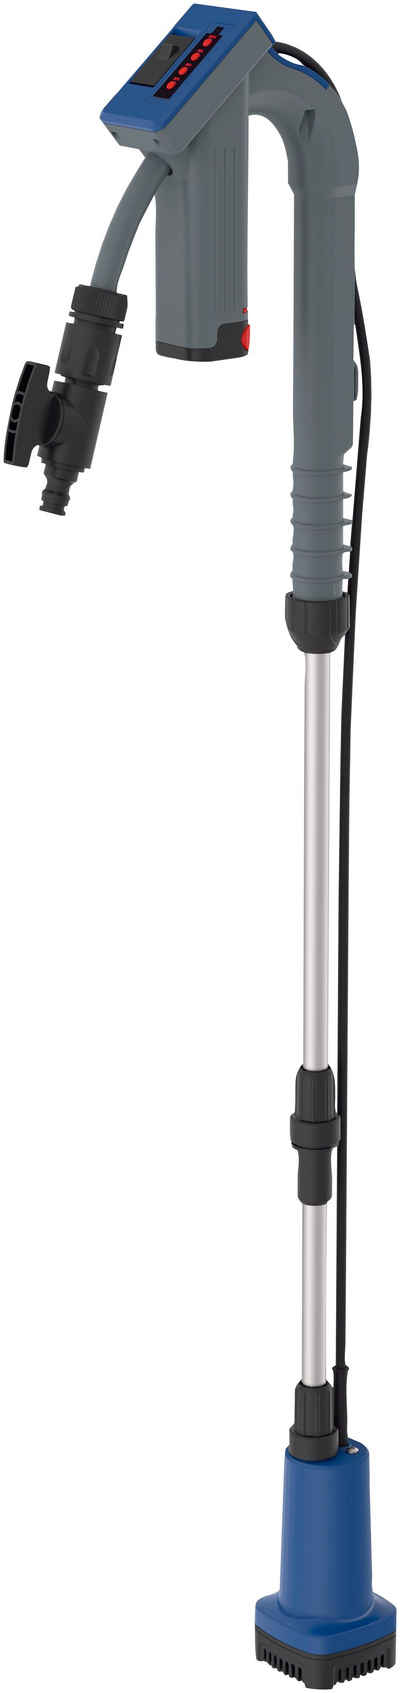 Güde Regenfasspumpe »RFP 12-201-04«, 1500 l/h max. Fördermenge, mit Akku und Ladegerät